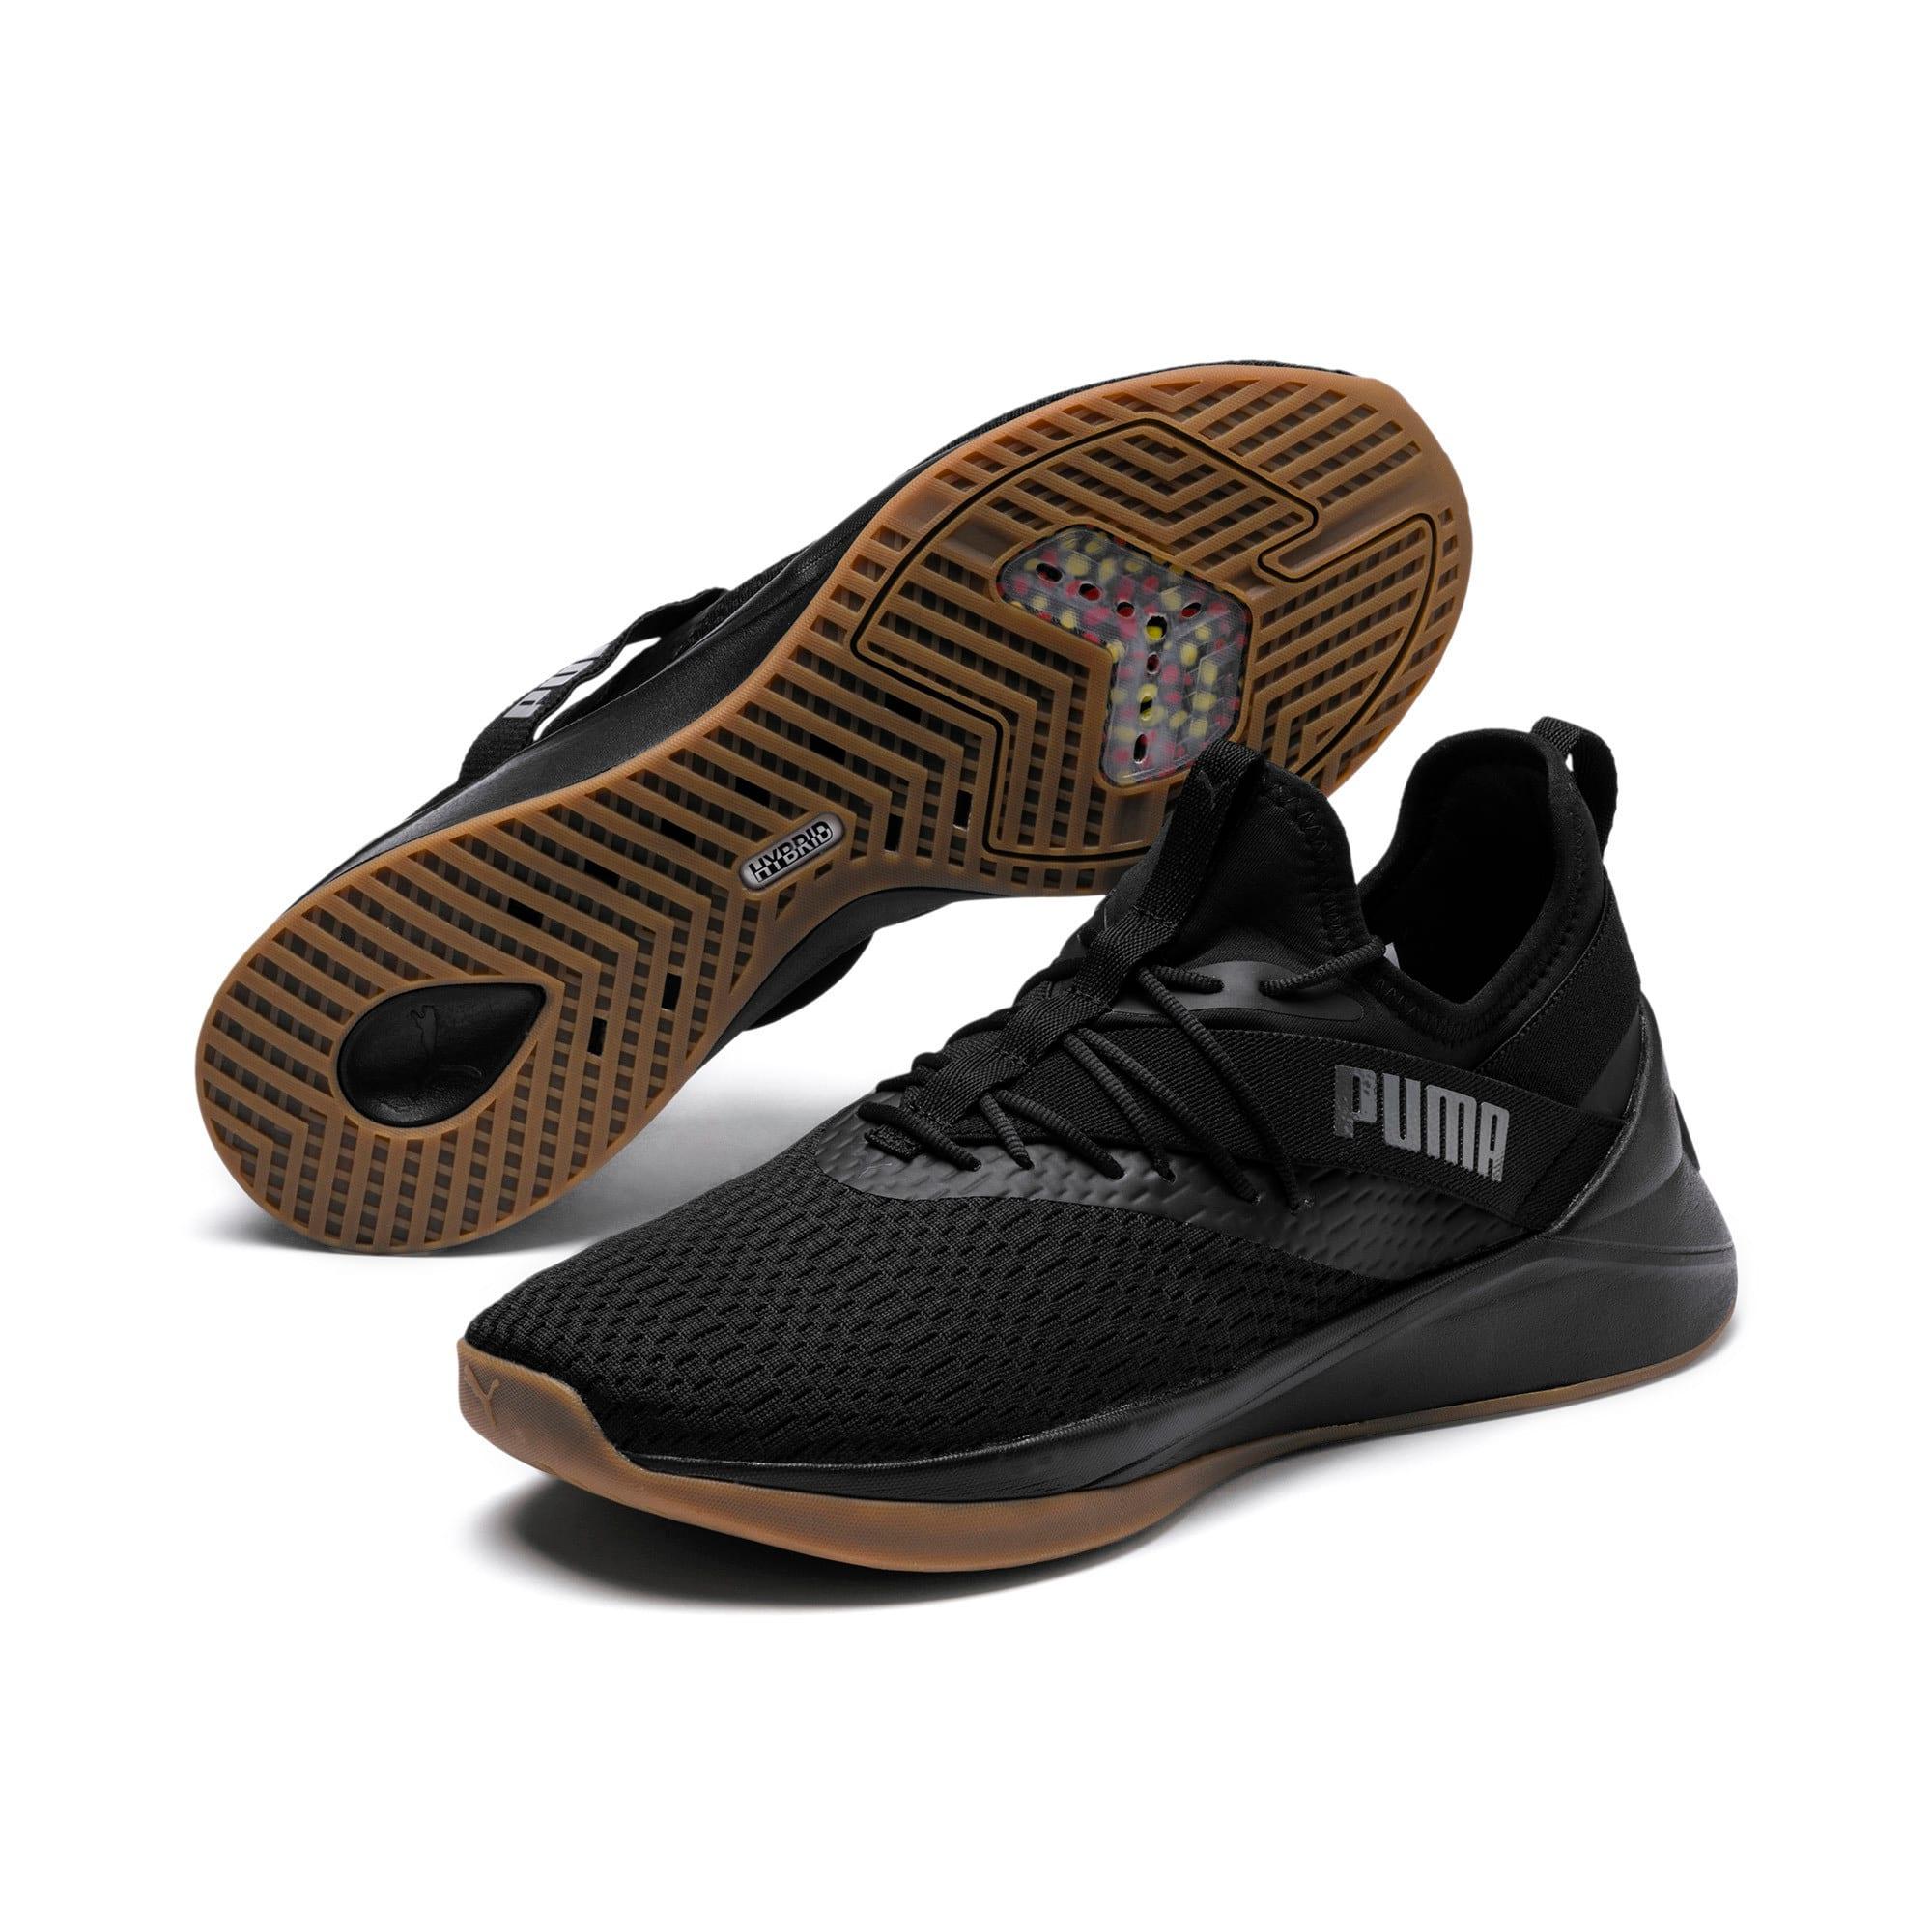 Thumbnail 2 of Jaab XT Summer Herren Sneaker, Puma Black-Asphalt, medium